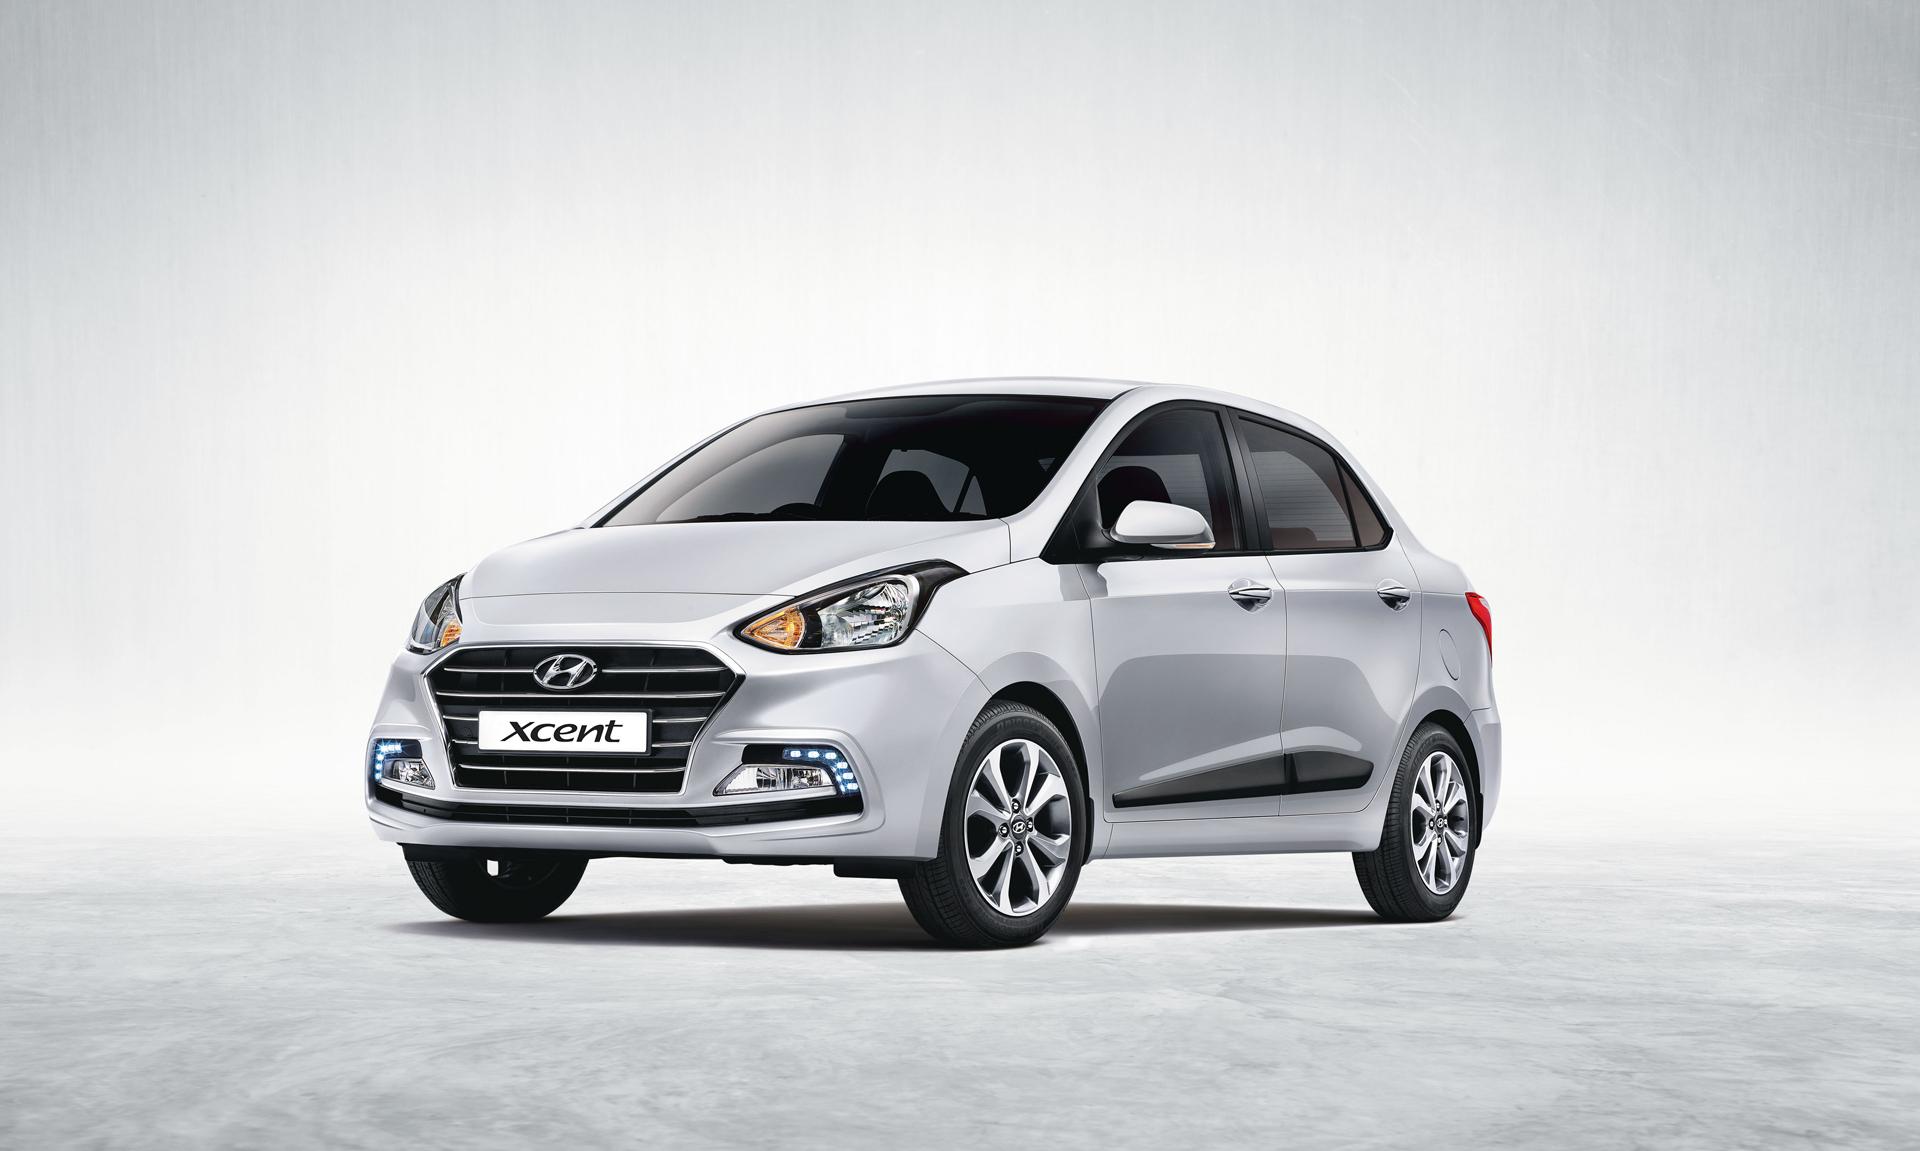 Hyundai Xcent 2017 S CRDi Image